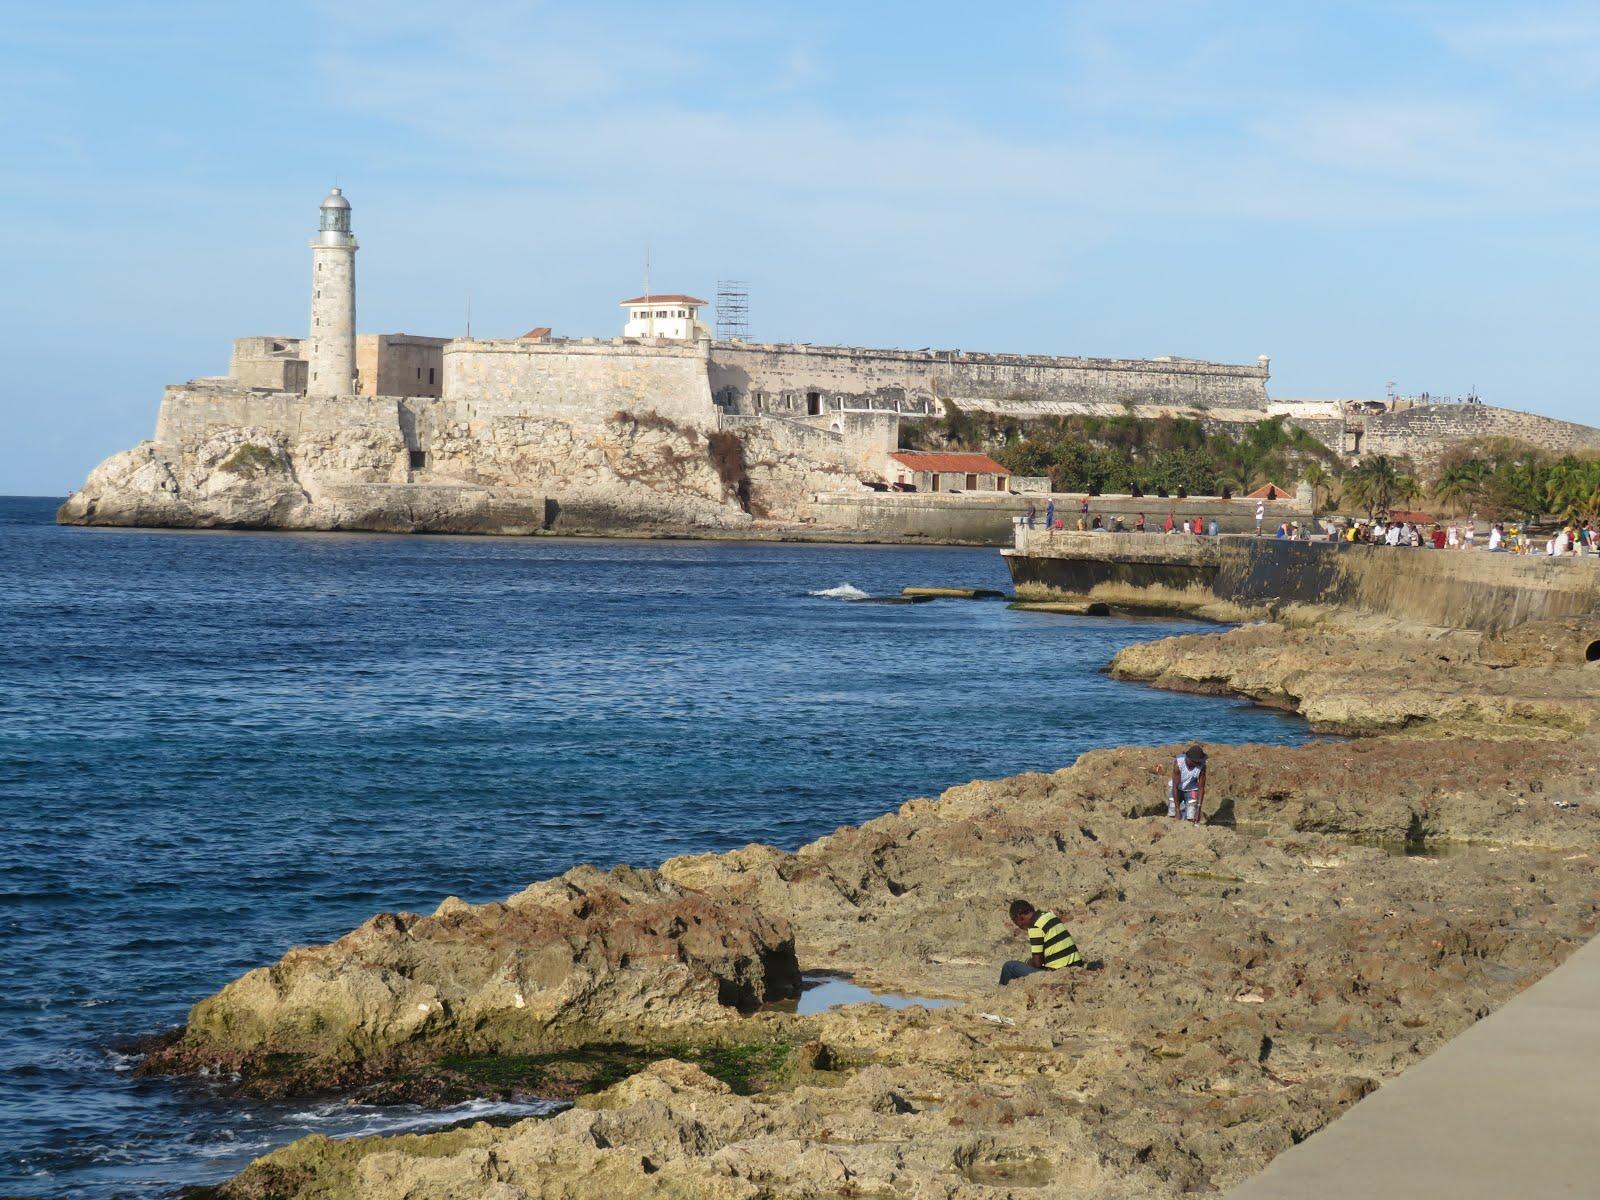 El Morro Fortress in Havana